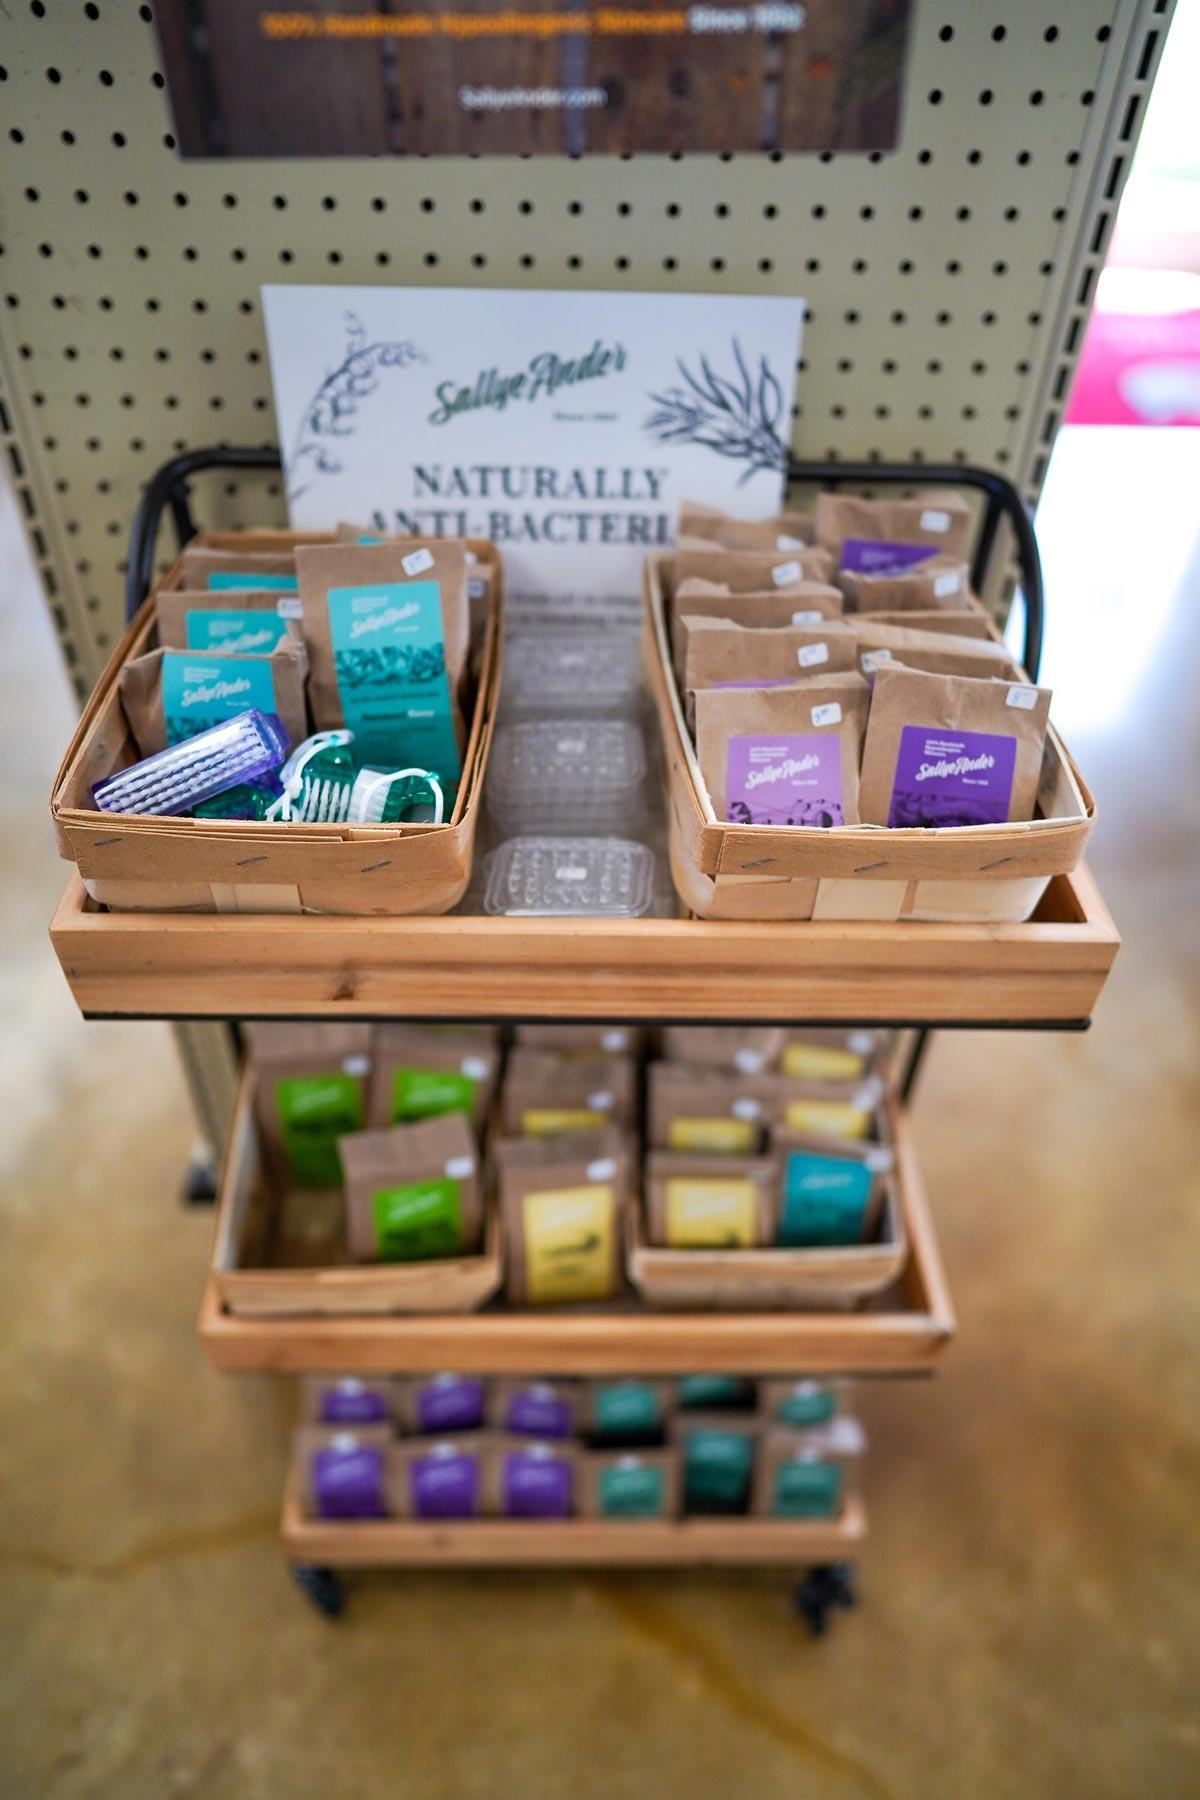 SallyeAnder's Anti-Bacterial Soaps